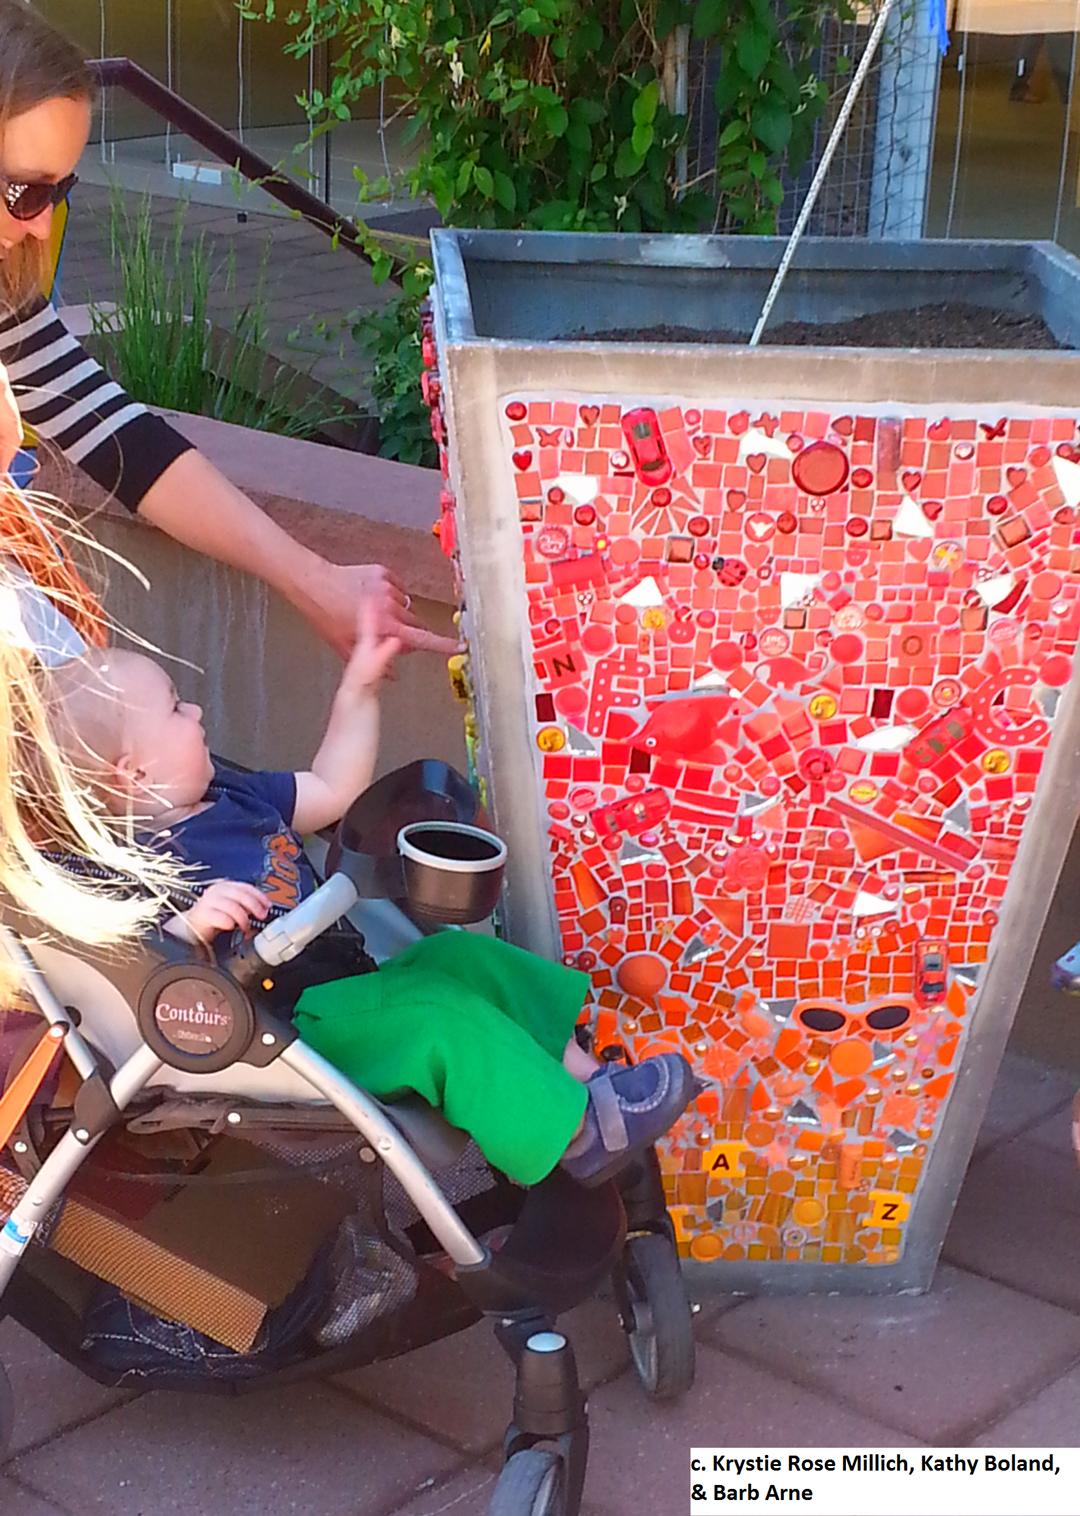 krystie rose millich denver boulder co tile mosaic aritst mosaic planter